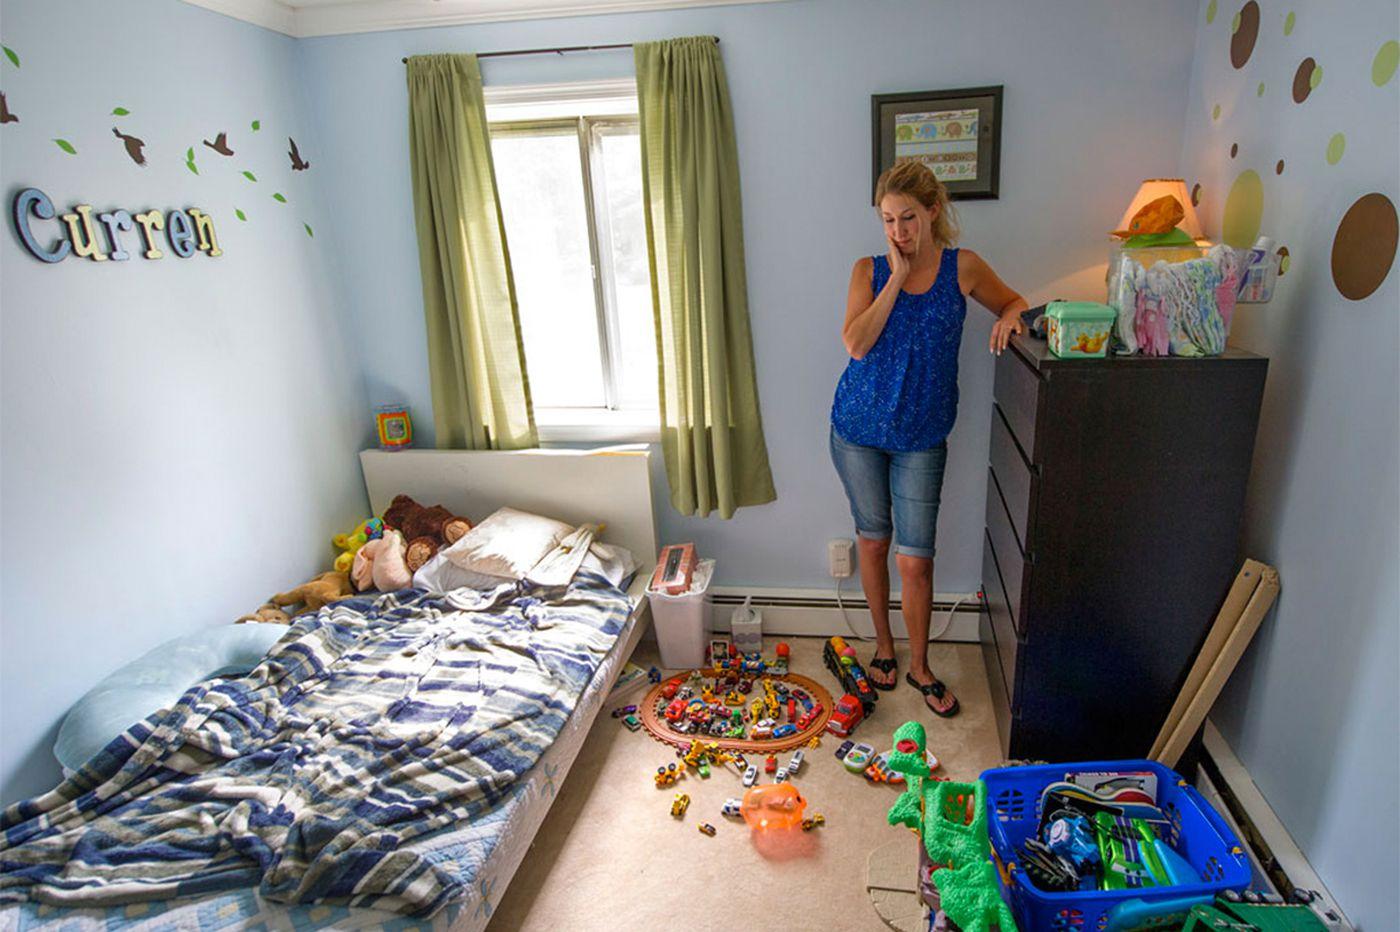 Ikea To Halt Of Deadly Dressers